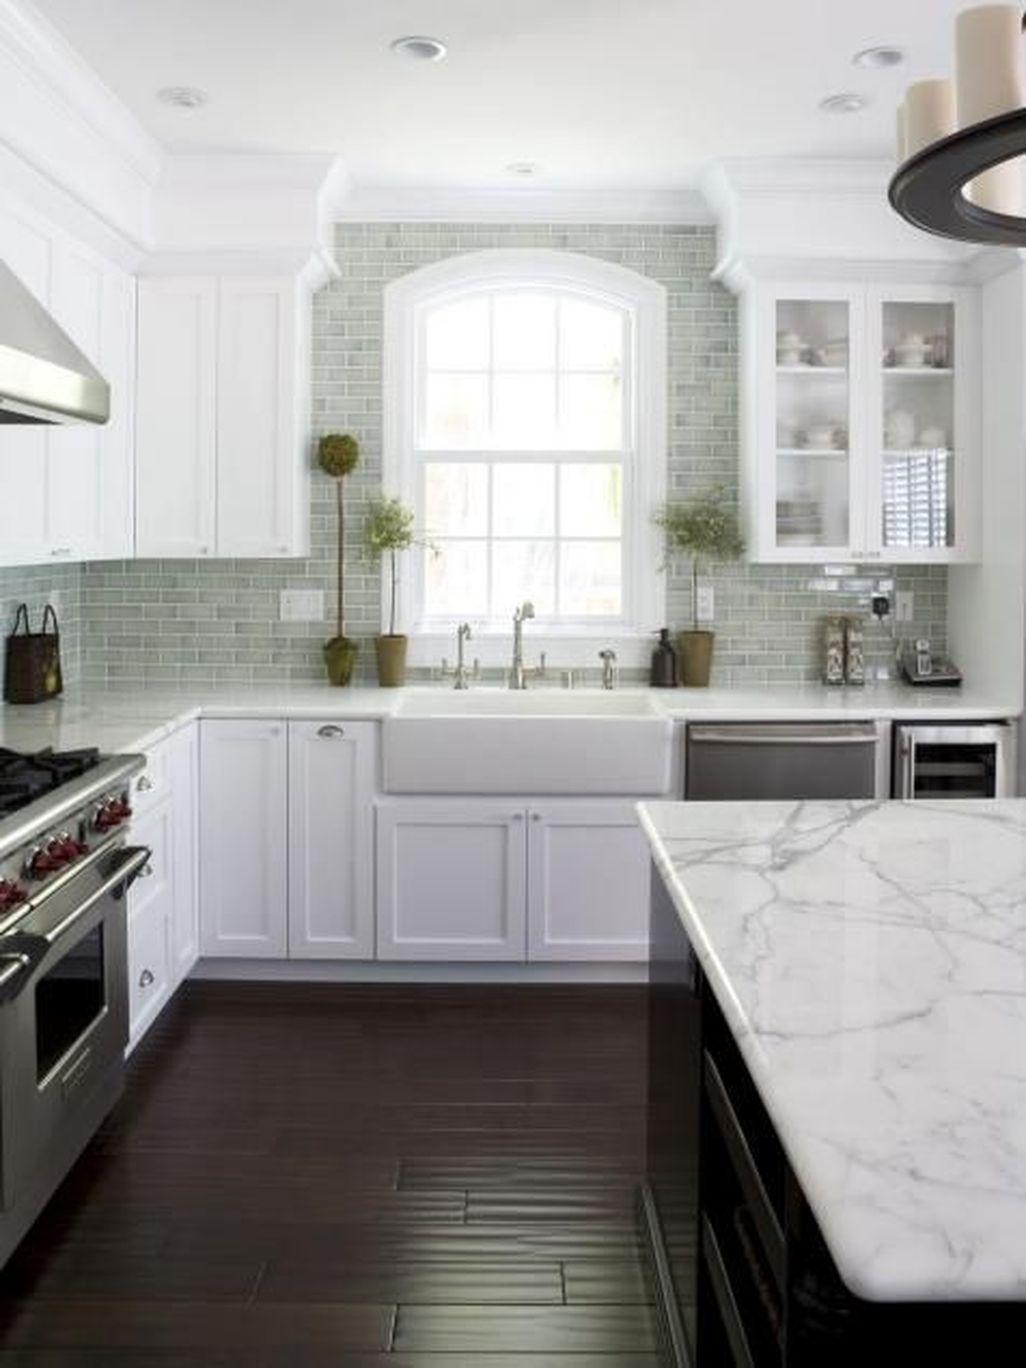 Awesome White Kitchen Backsplash Design Ideas 19